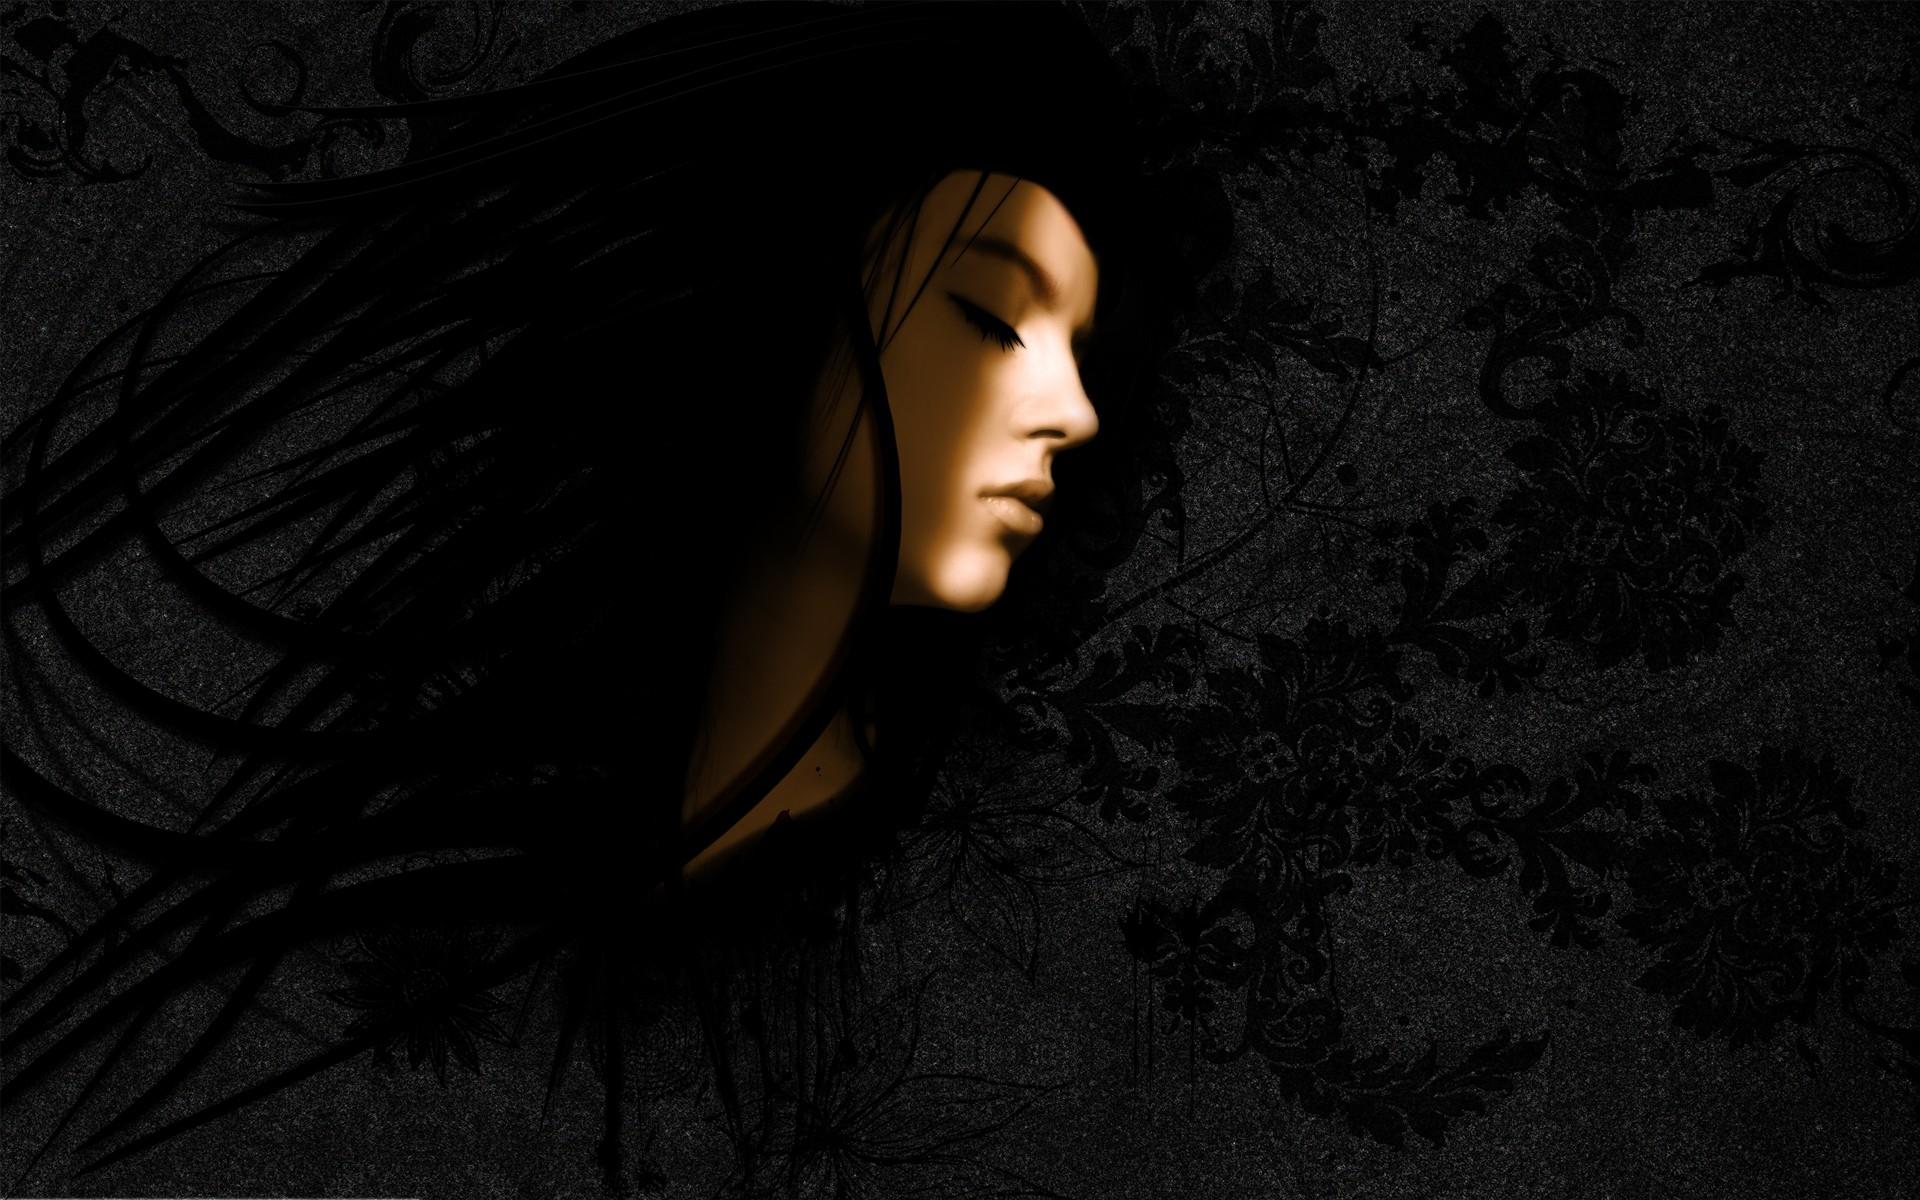 Wallpaper : brunette, shadow, light, girl, beauty